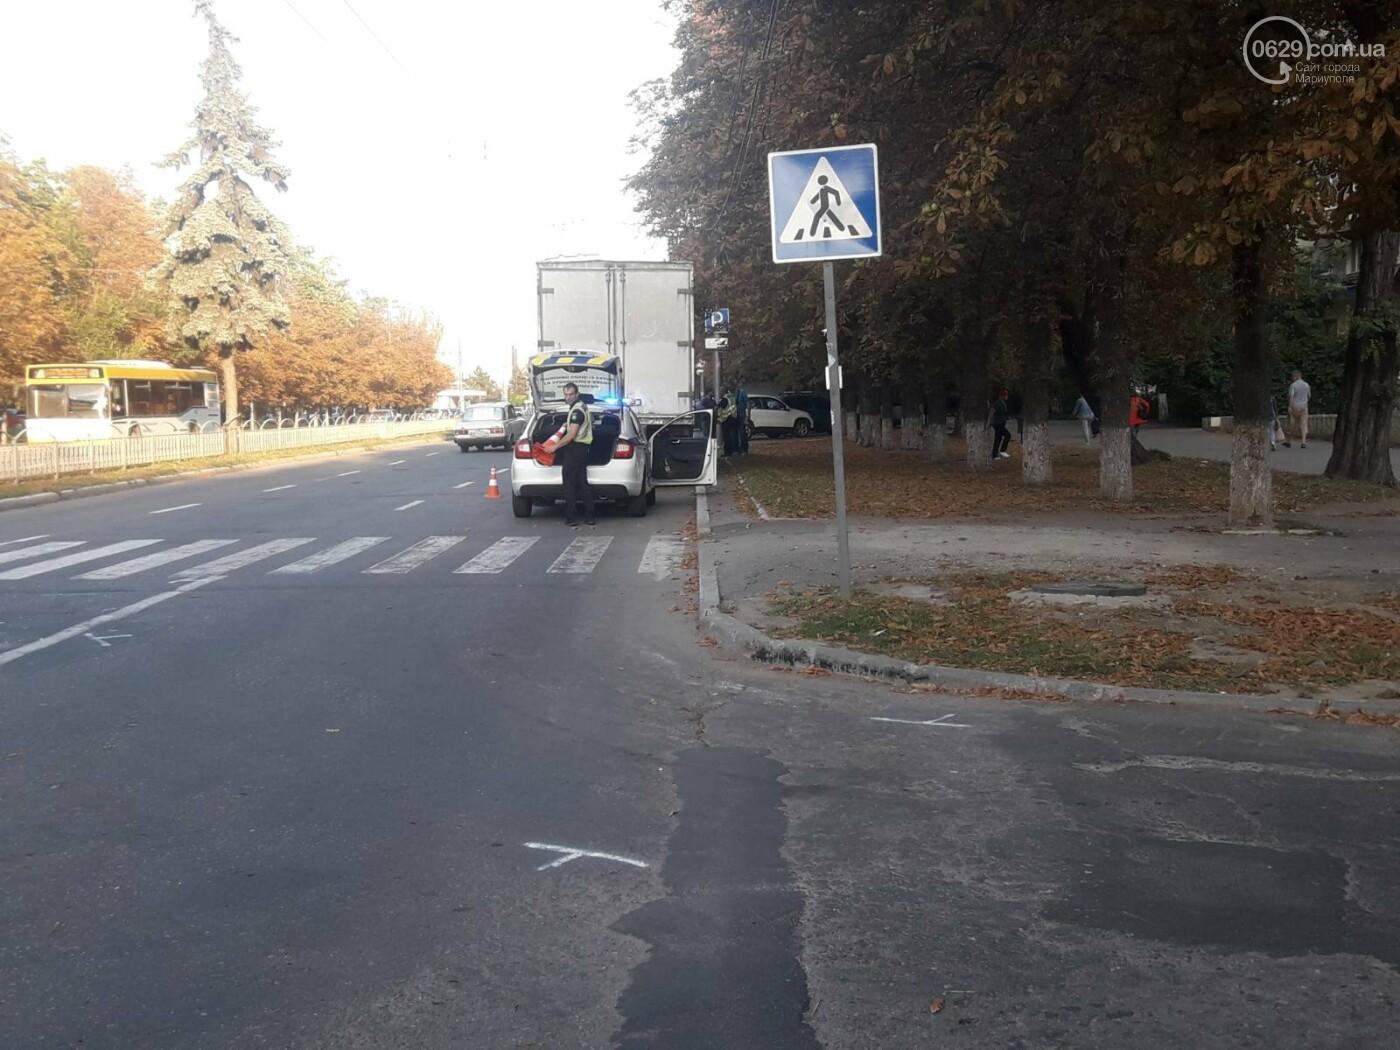 В Мариуполе грузовик догнал легковушку, - ФОТО, фото-1